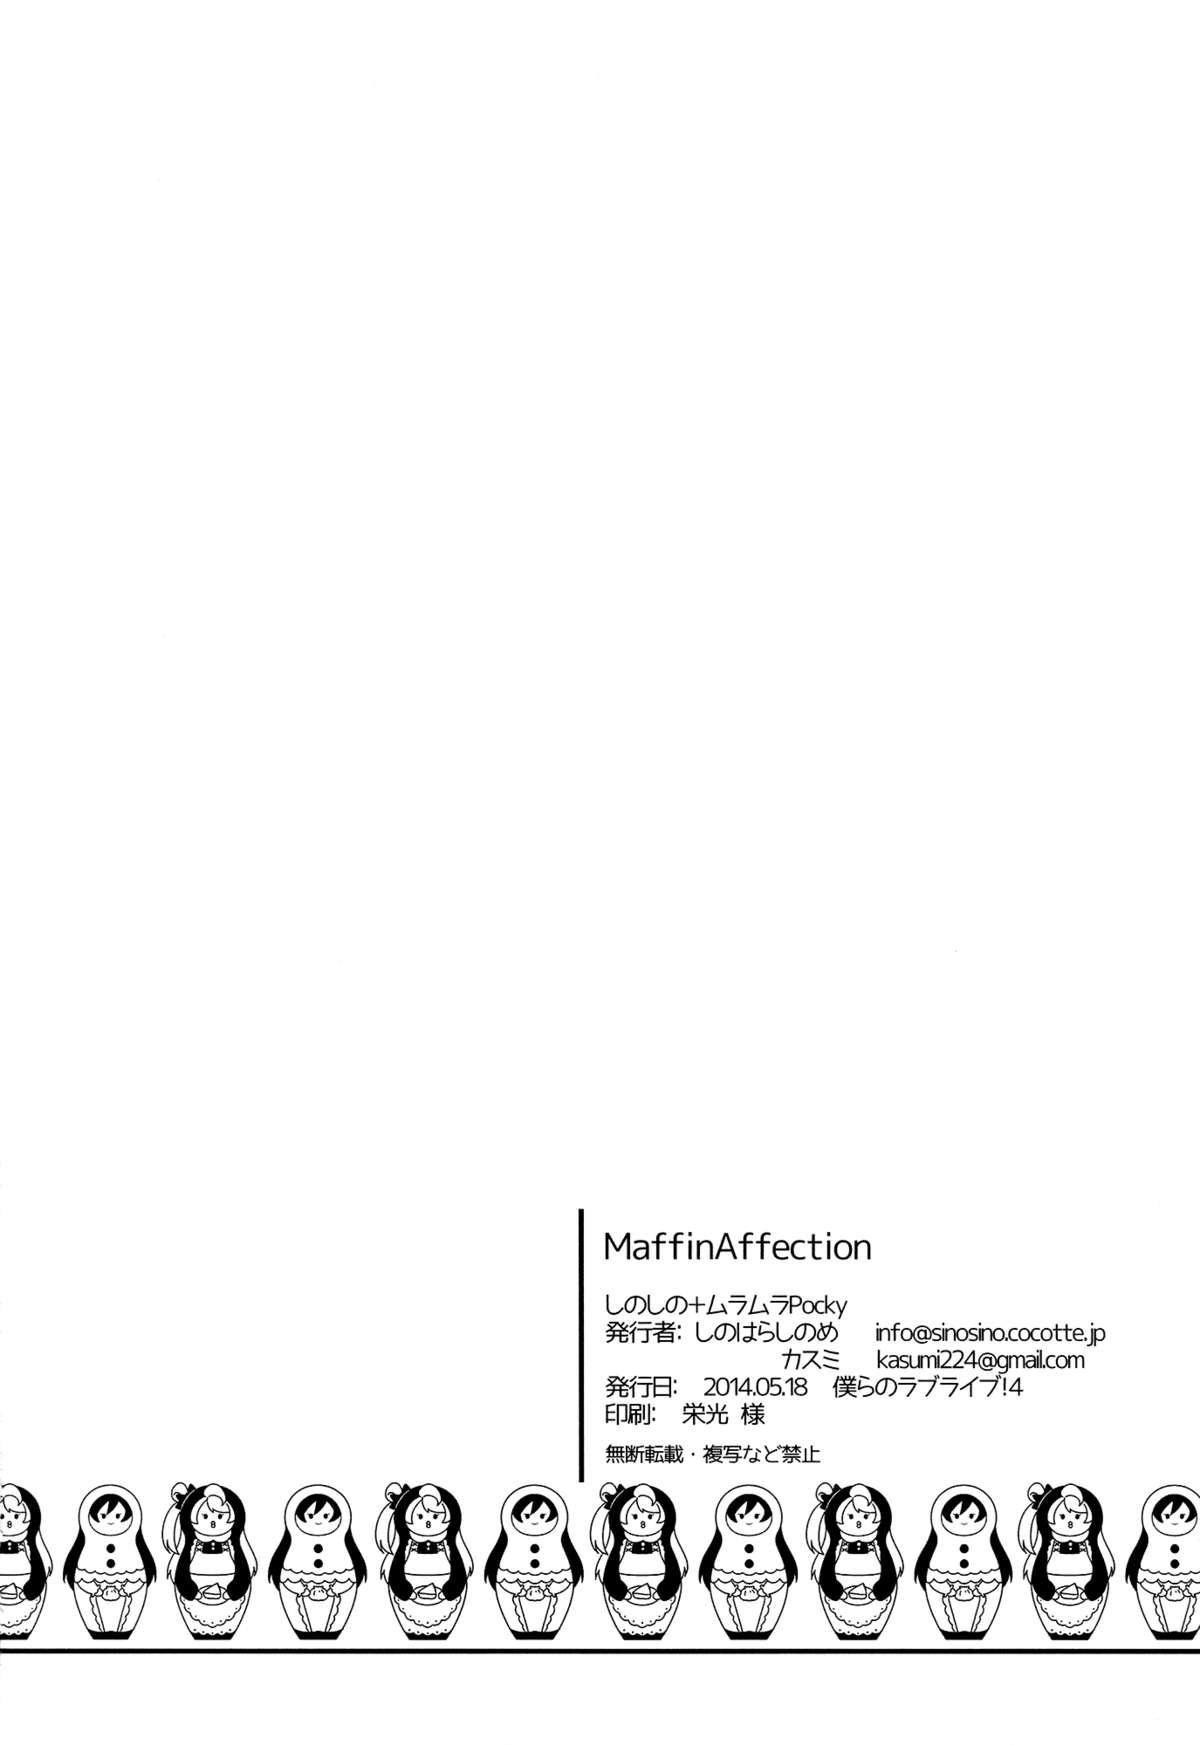 HentaiVN.net - Ảnh 26 - Muffin Affection (Love Live!) - Oneshot